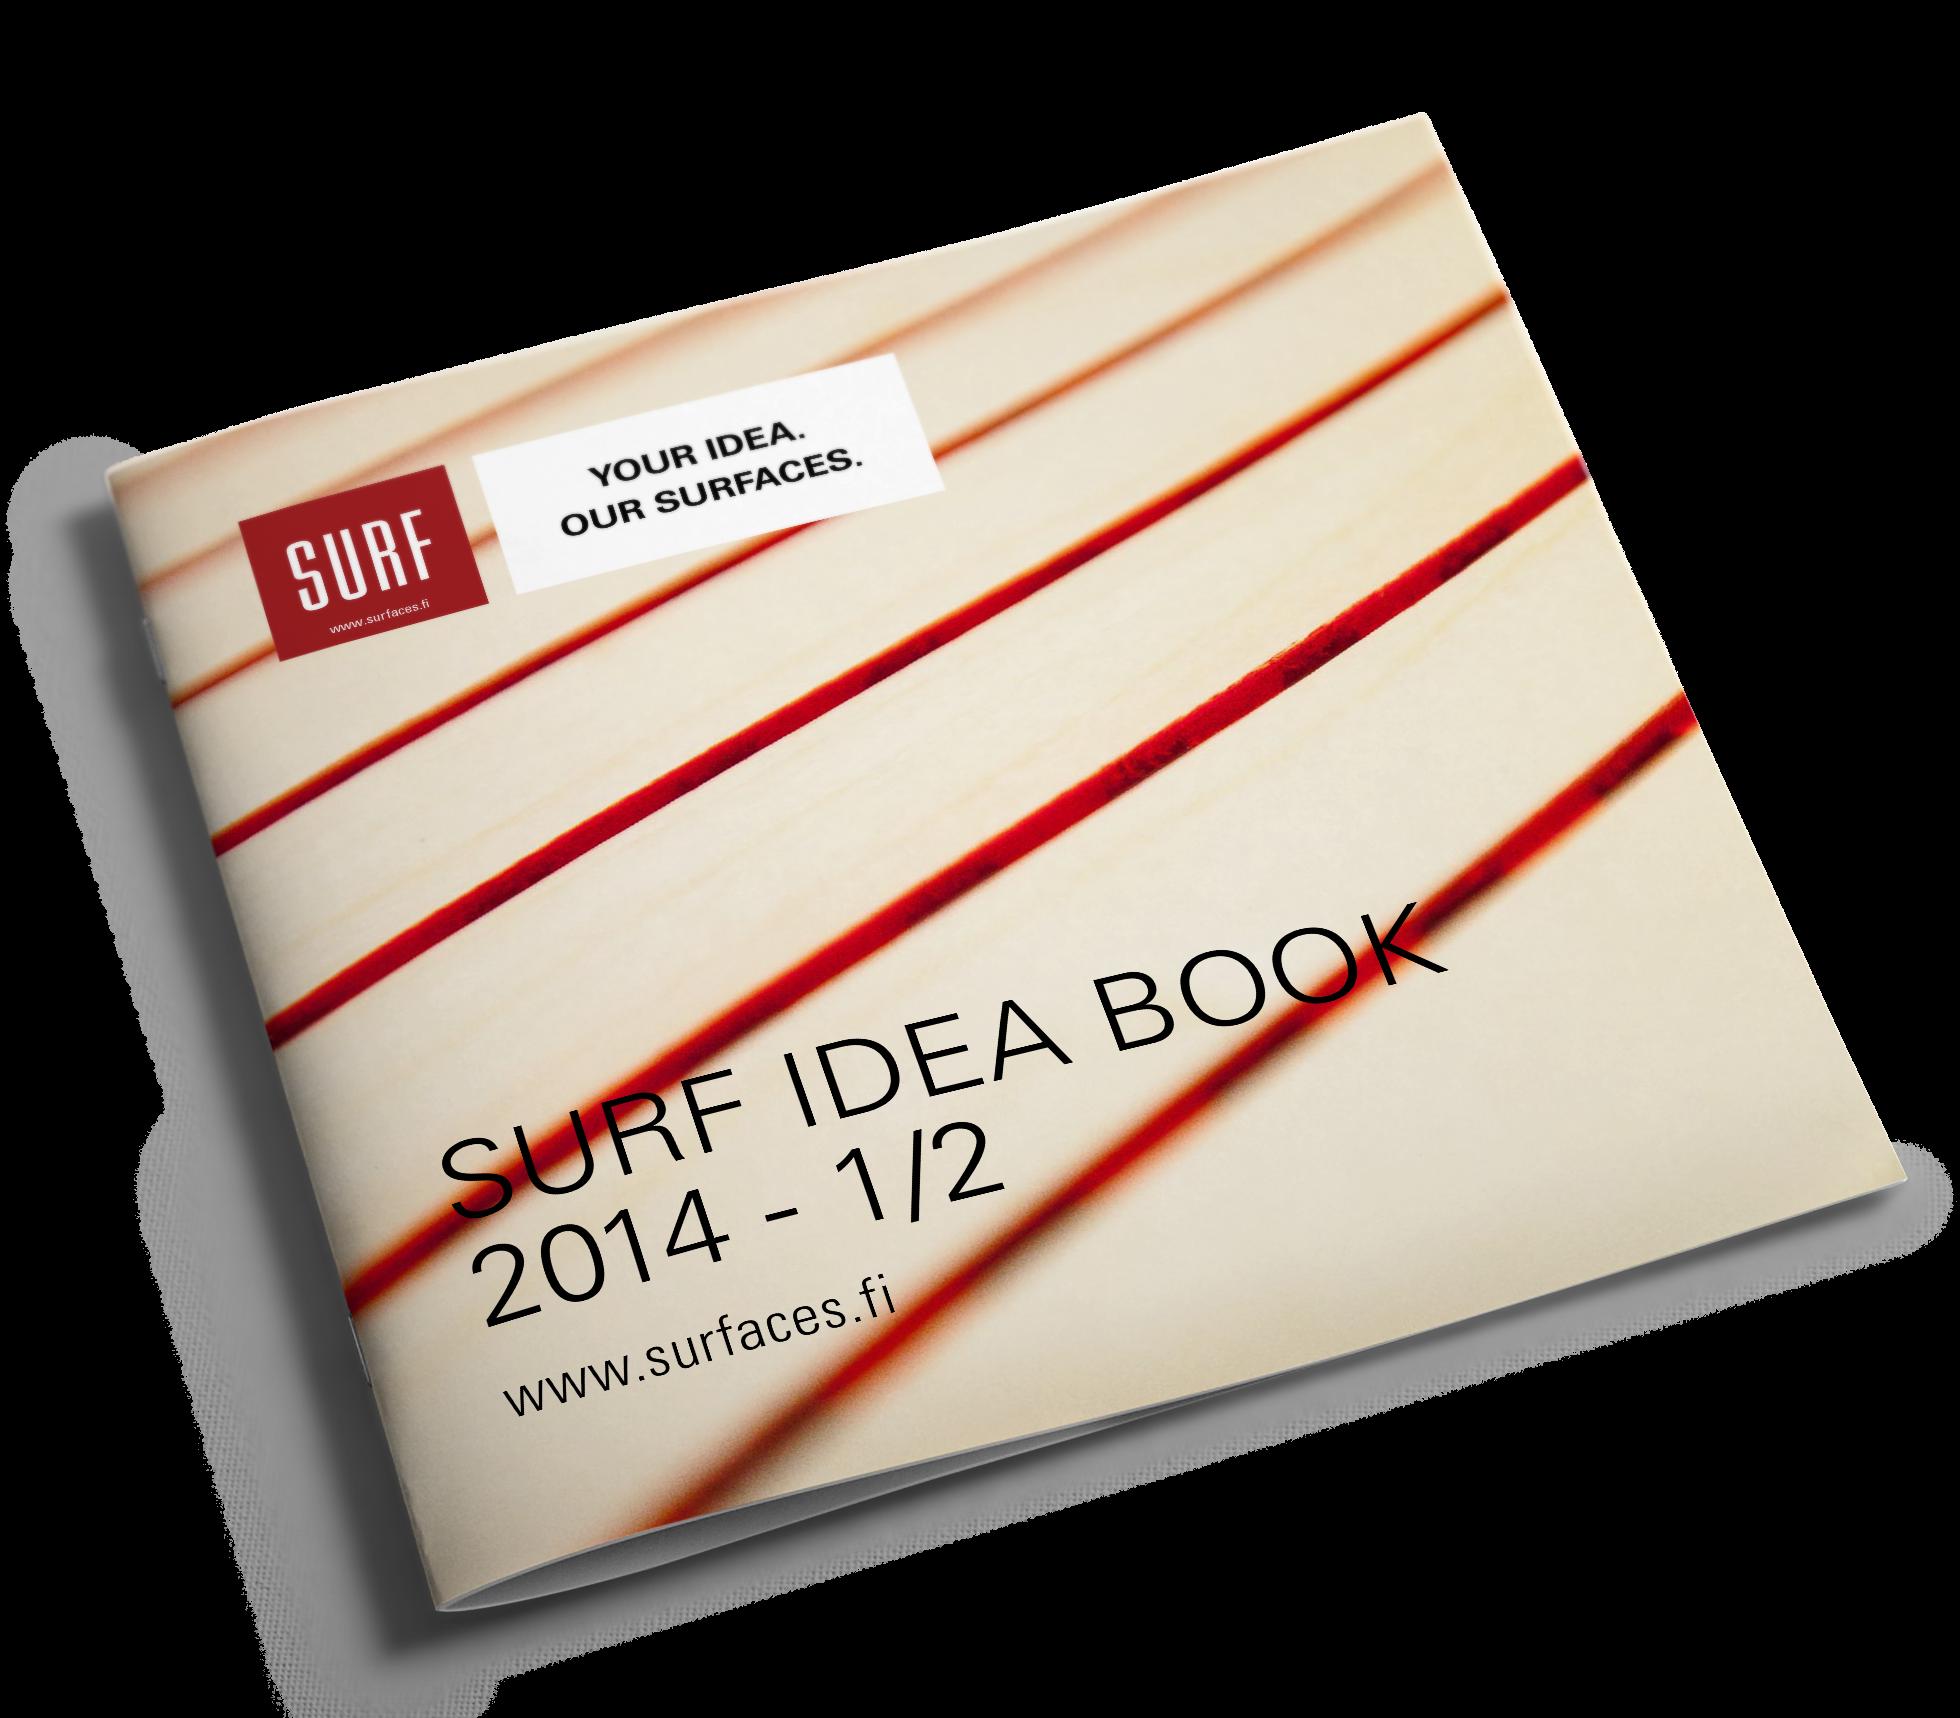 SURF Idea Book 2014 - 1/2